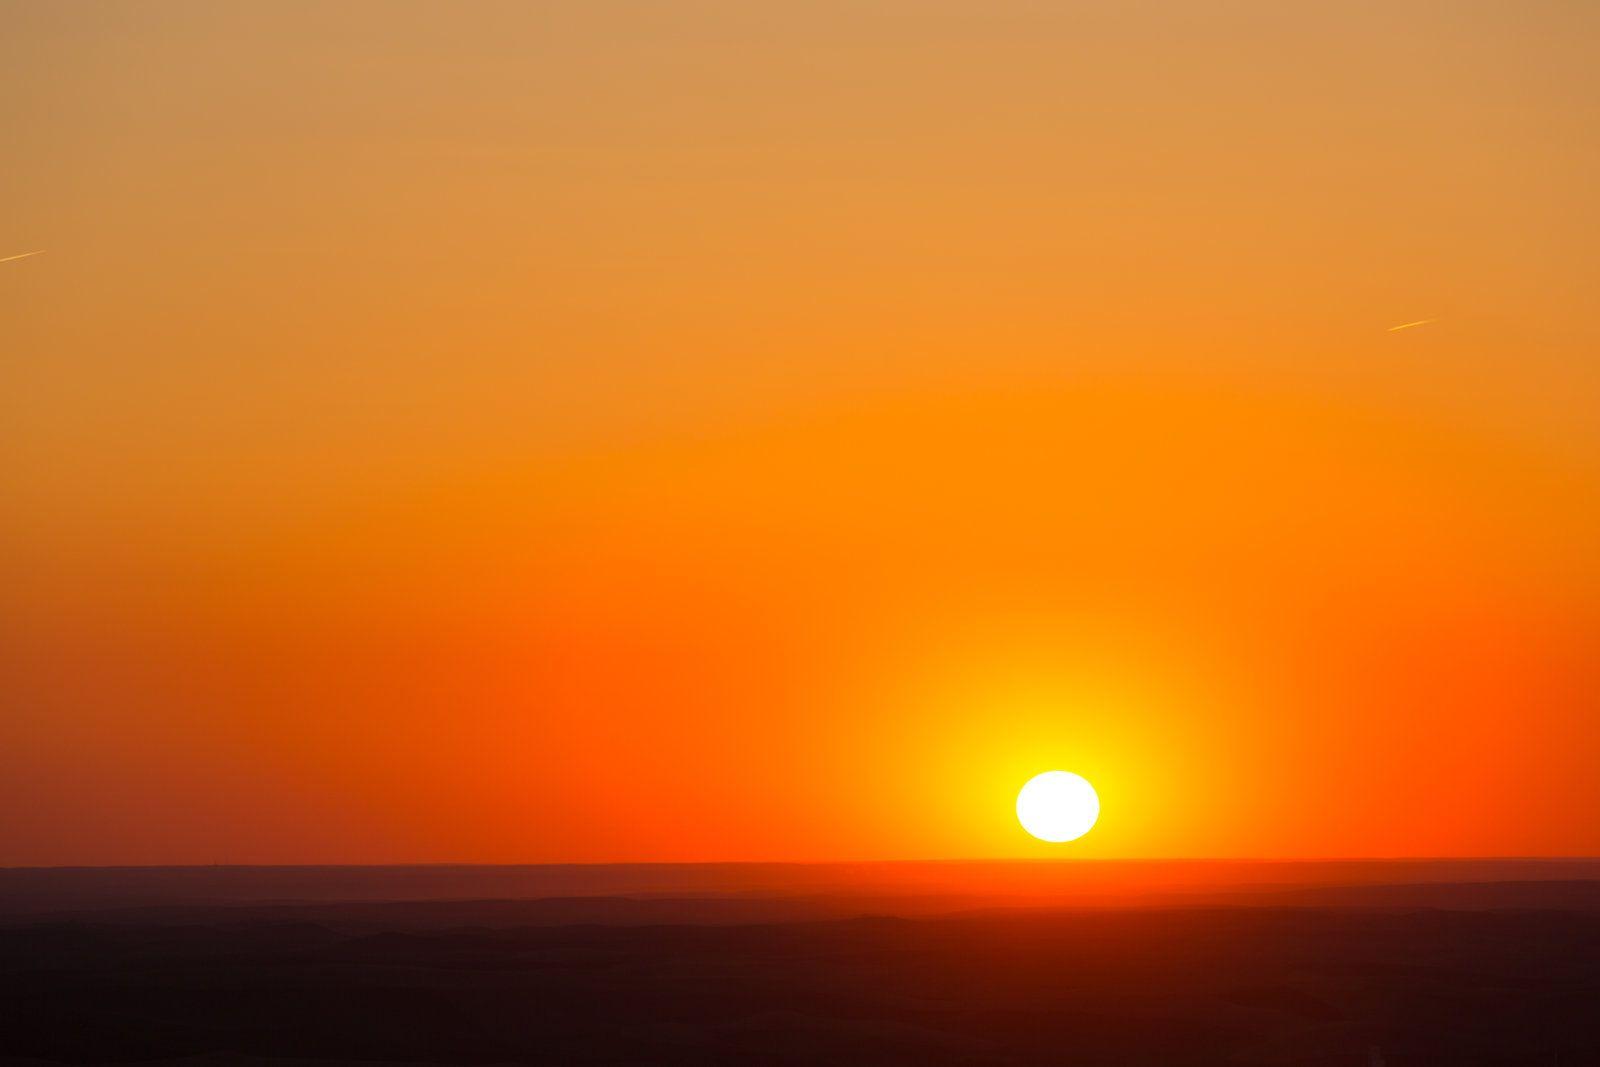 orange sunset google search orange pinterest